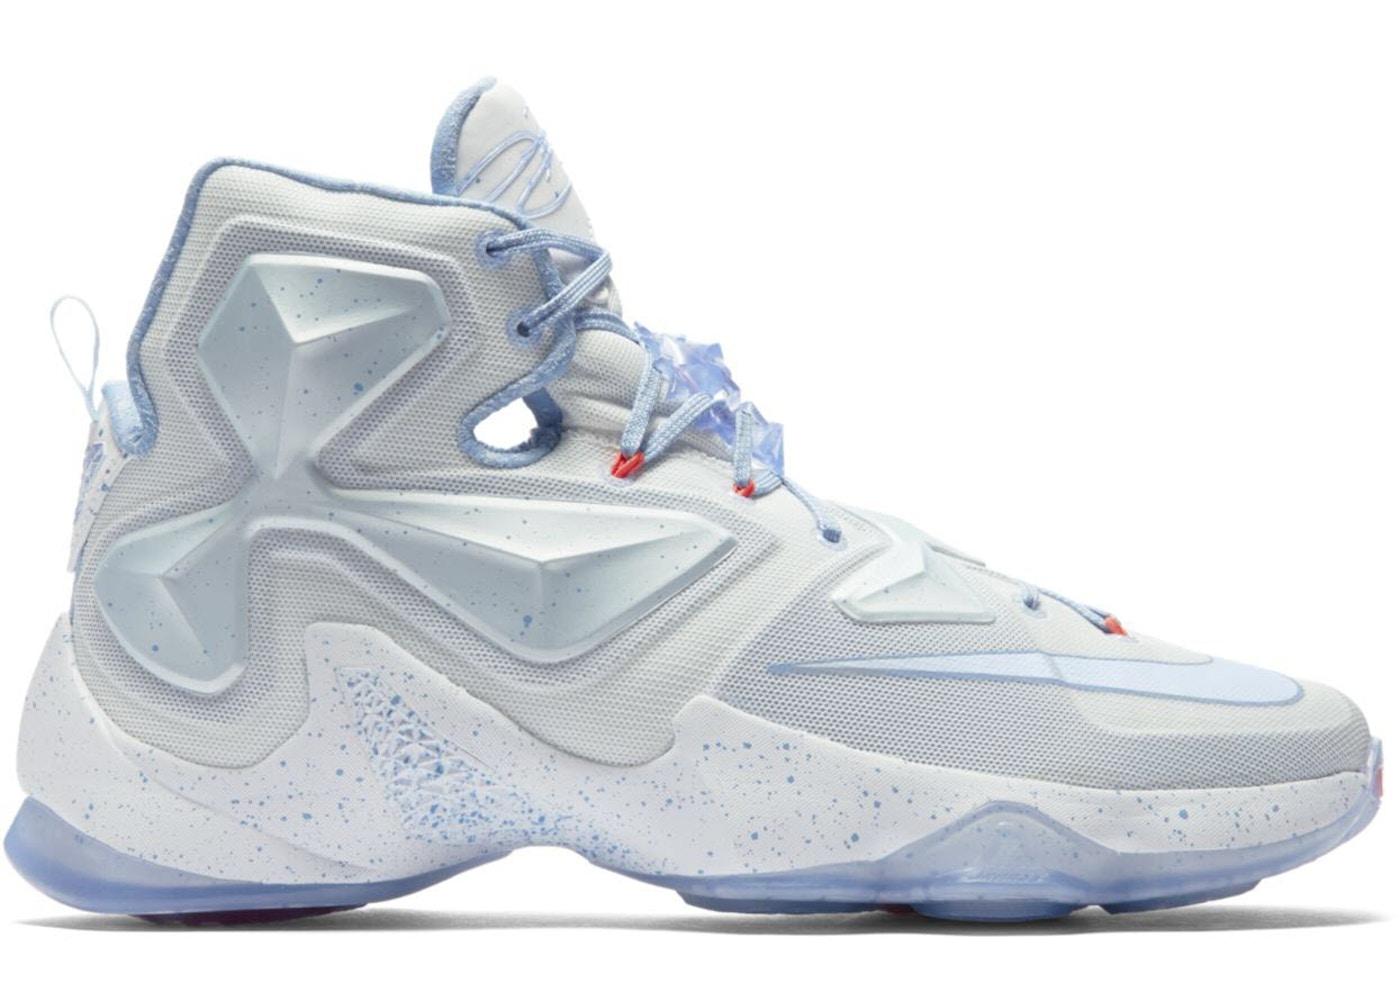 the best attitude 2e64a 6844e Nike LeBron 13 Shoes - Average Sale Price